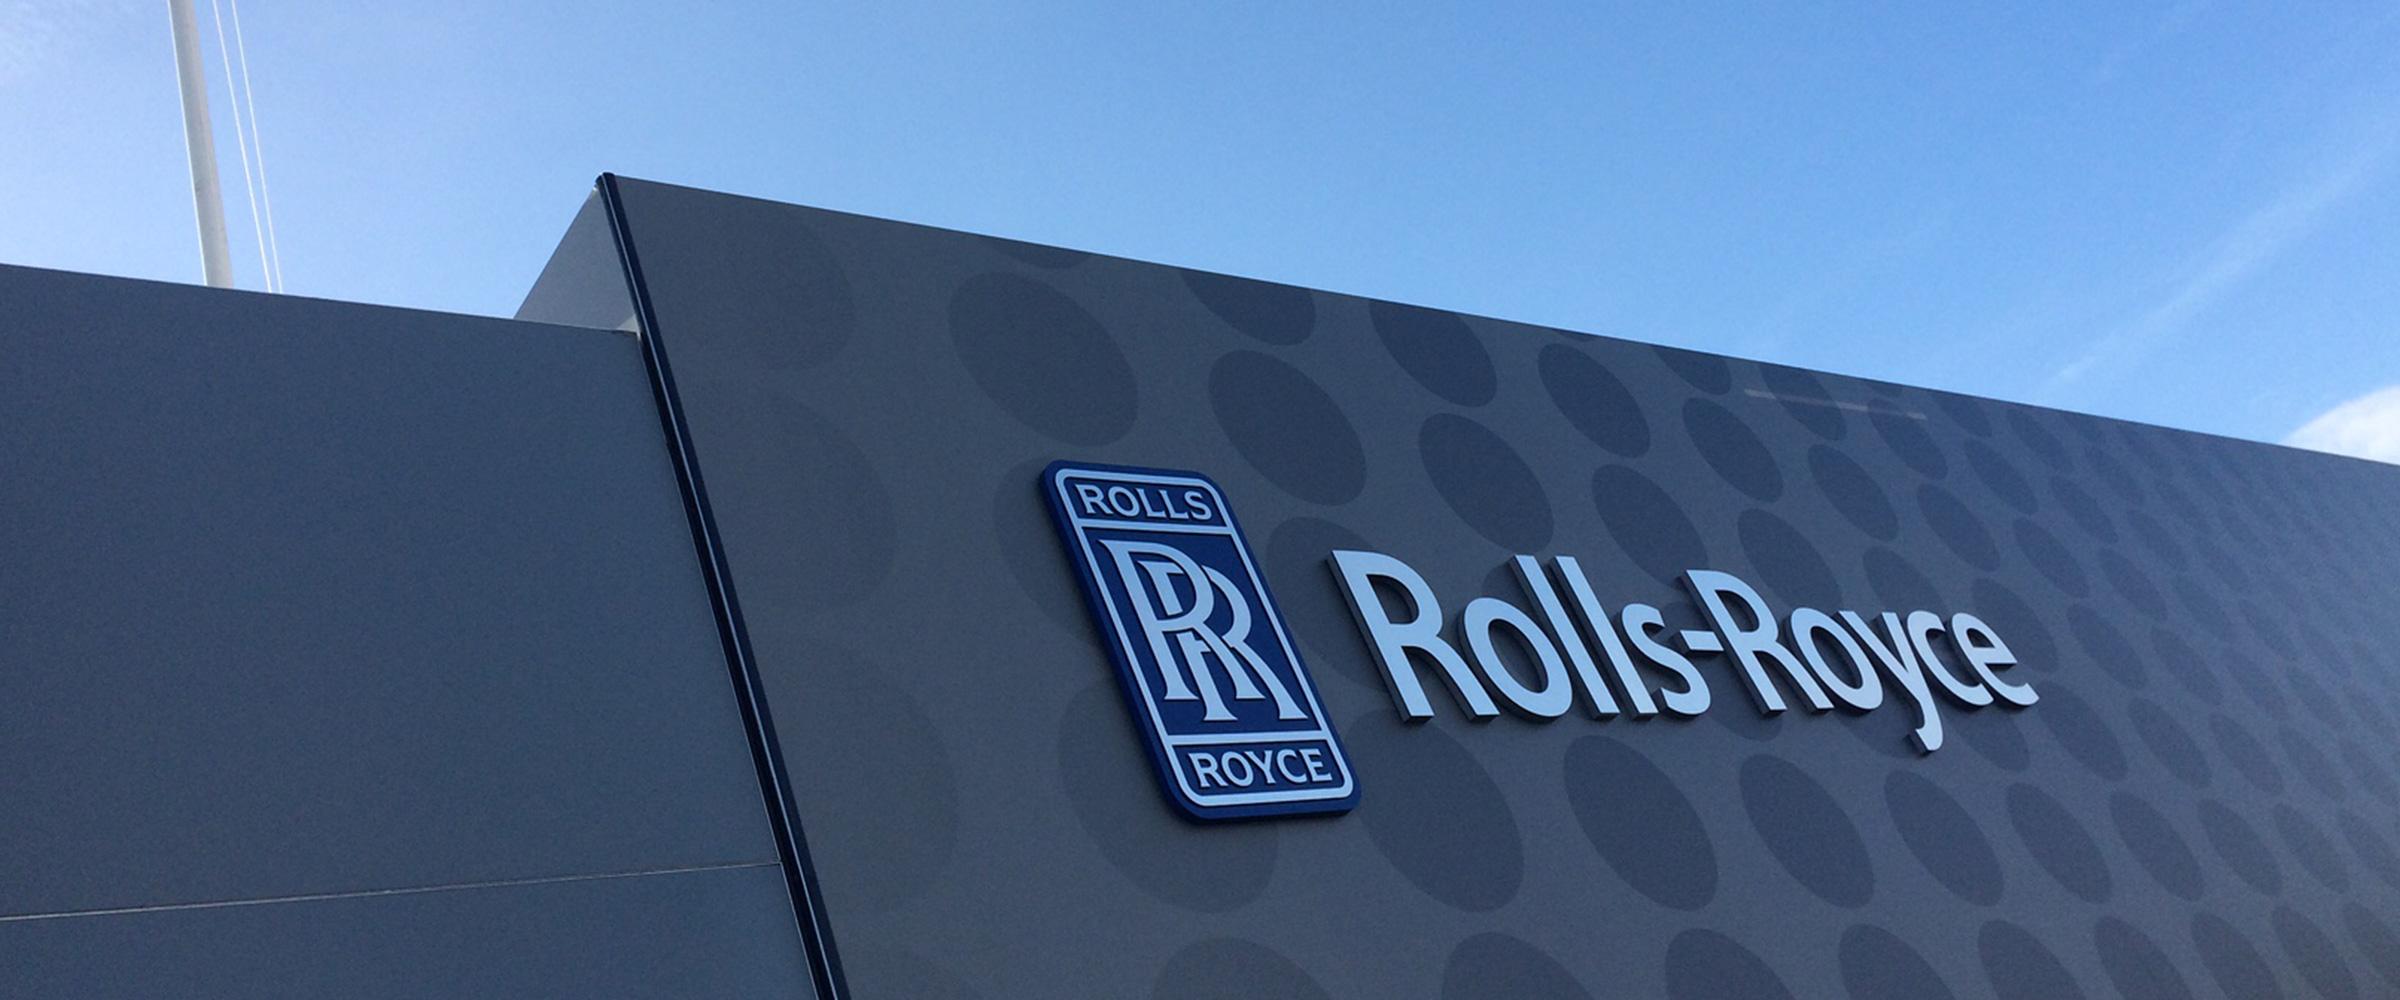 Rolls-Royce branding installed by Rocket Graphics